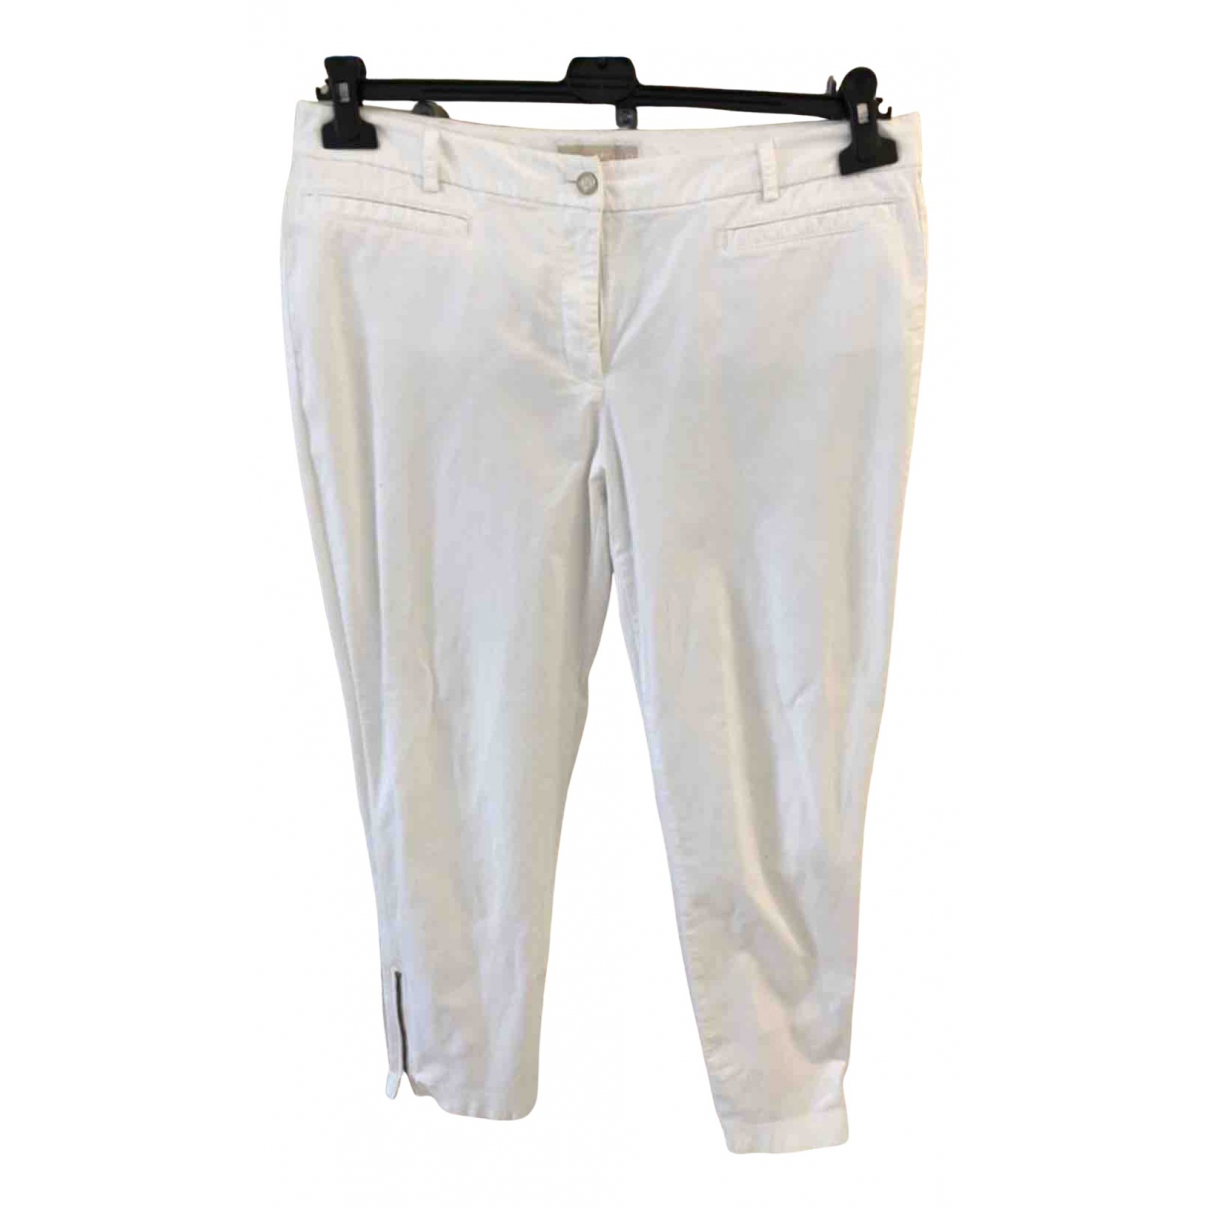 Michael Kors N White Cotton Trousers for Women 12 US